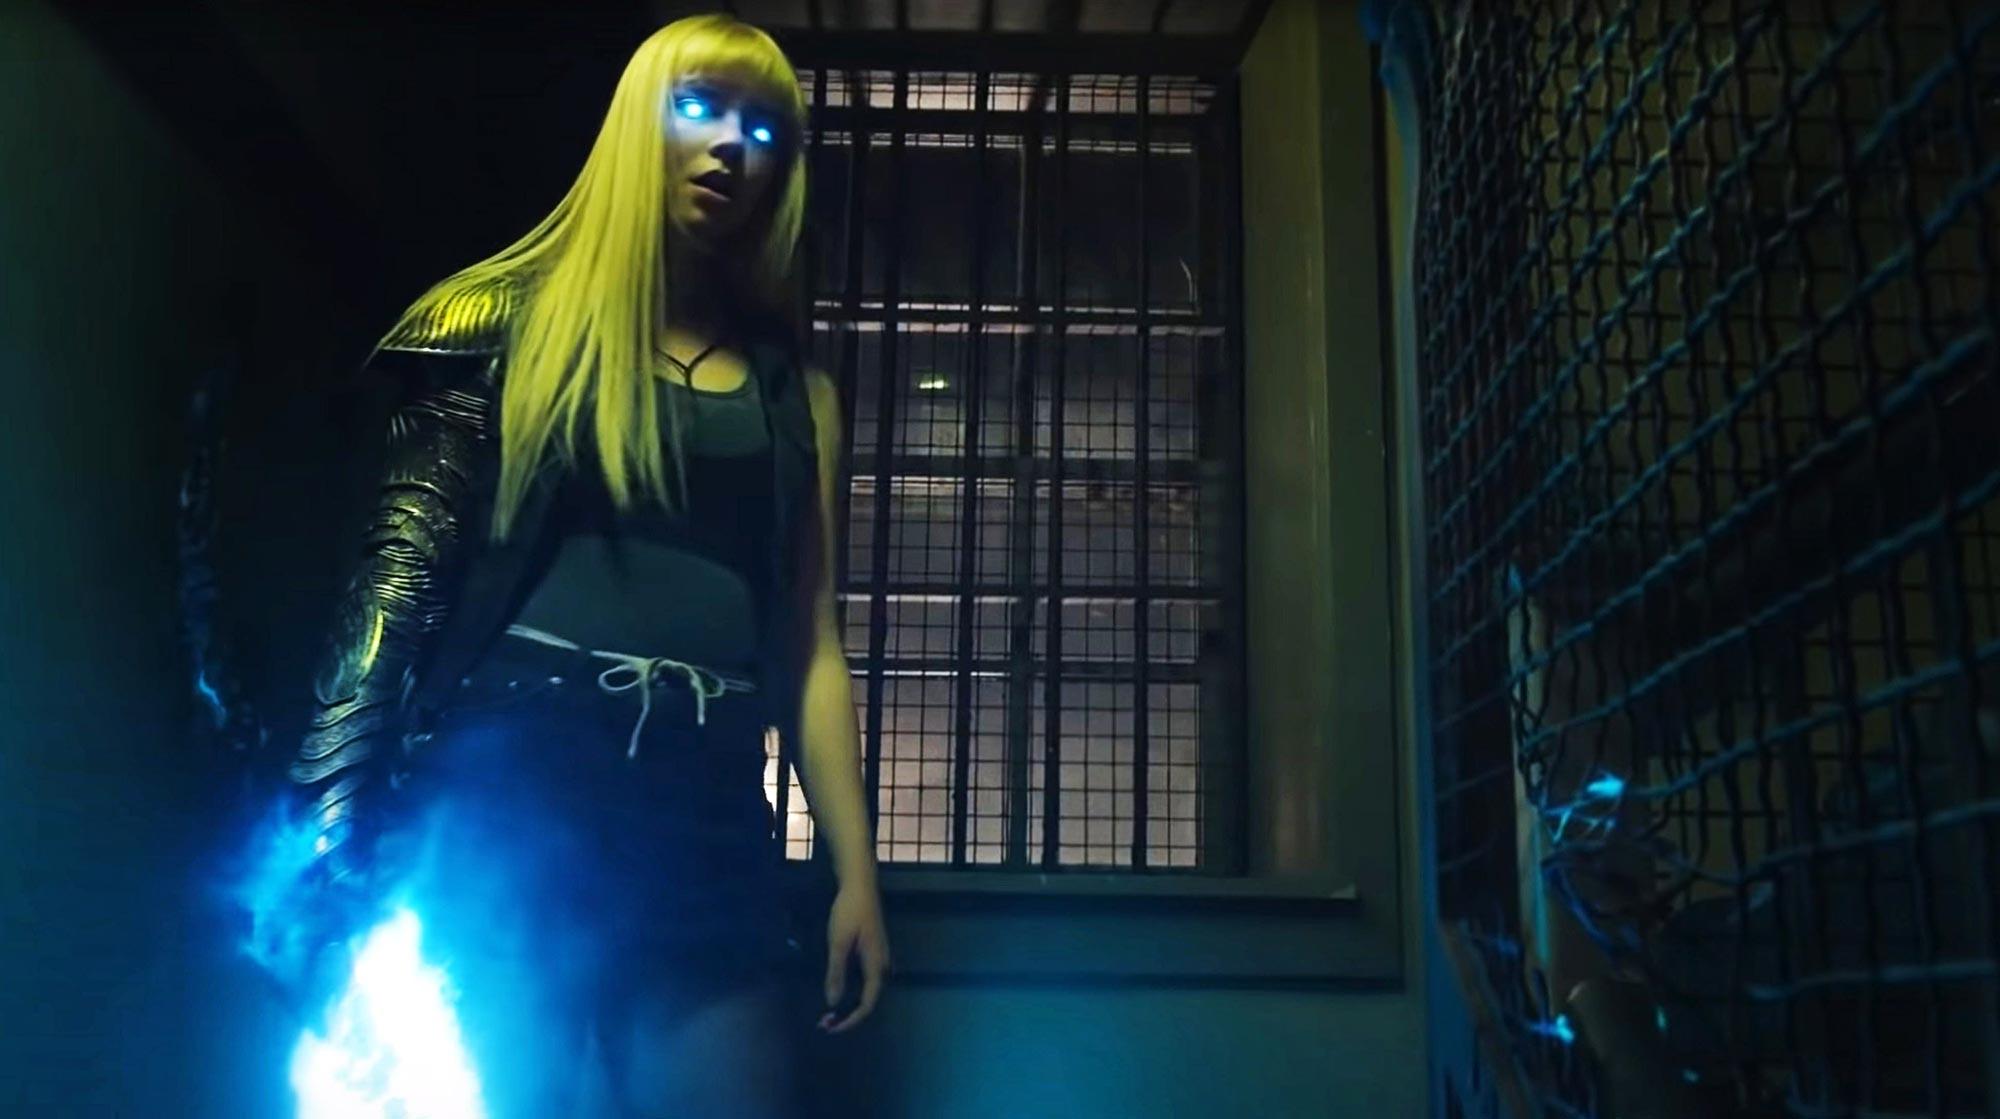 X-Men's horror story: The New Mutants' long, bumpy road to theaters | EW.com